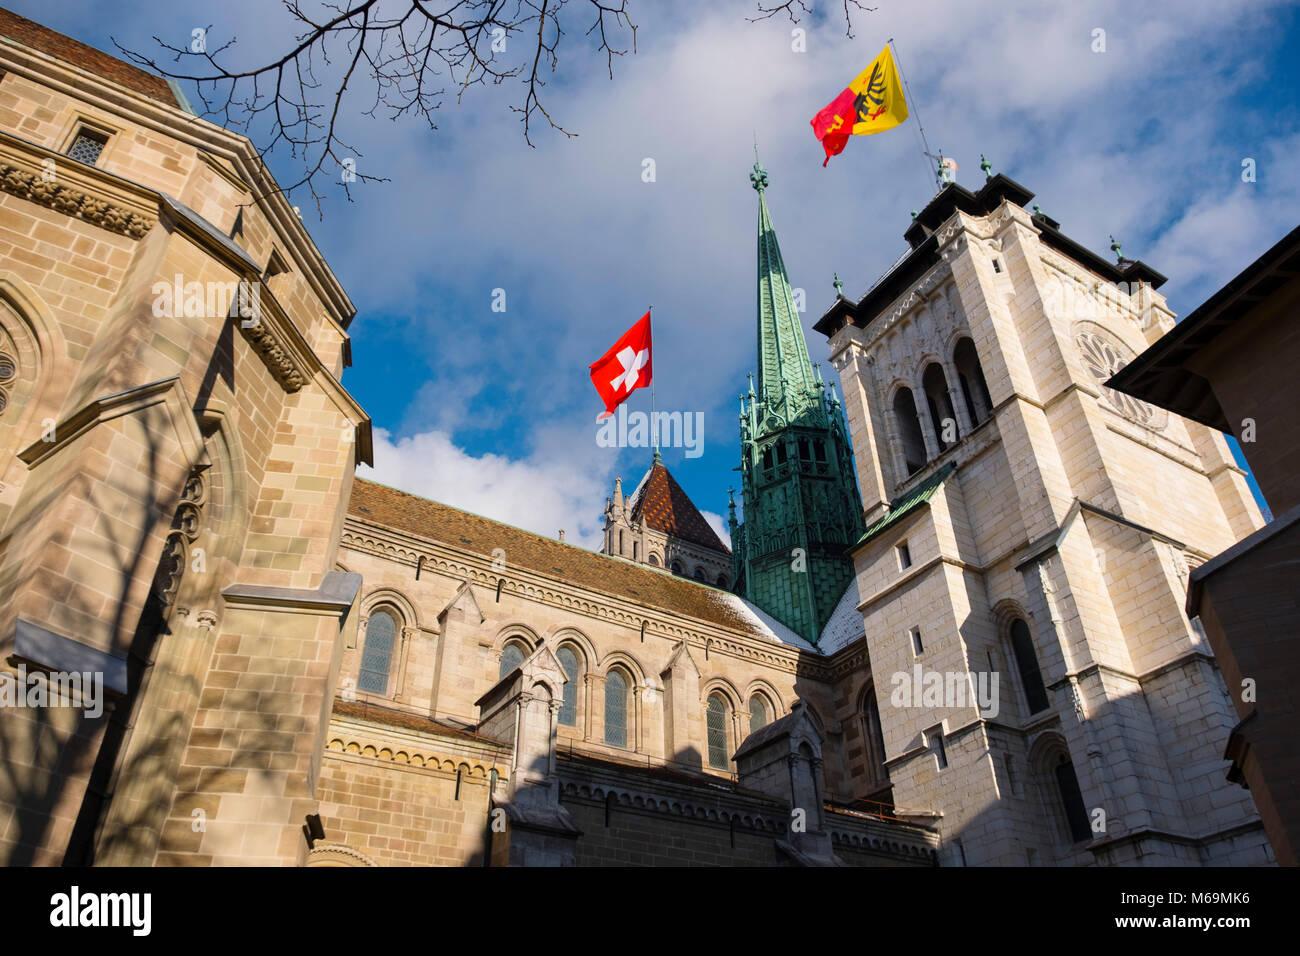 Saint-Pierre cathedral, historic center. Old town, Genève Suisse. Geneva. Switzerland Europe - Stock Image